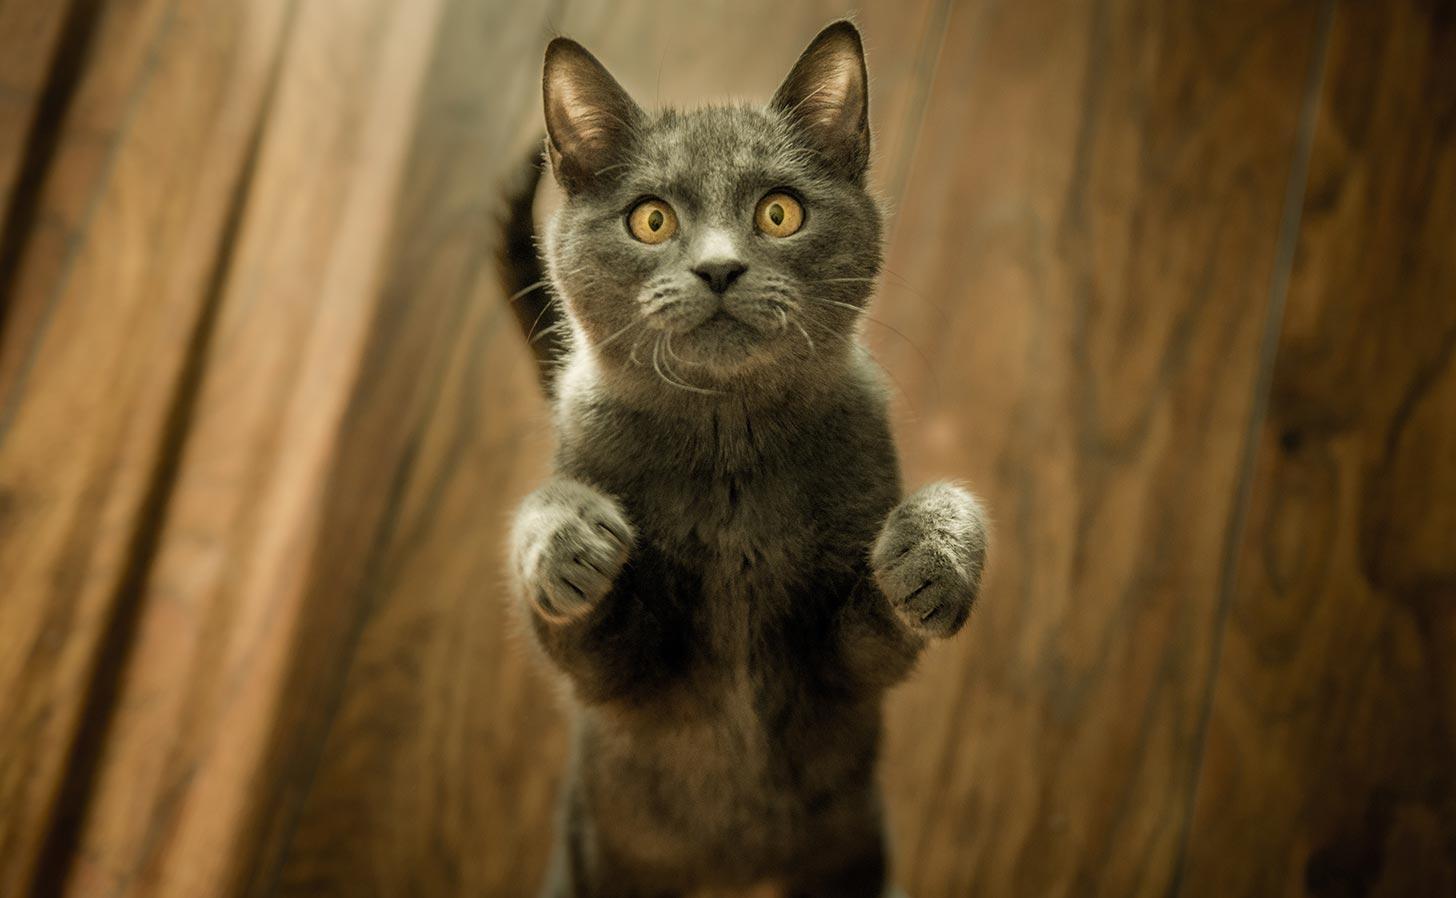 Katter får starkare skydd. Foto: Marko Blažević / Unsplash